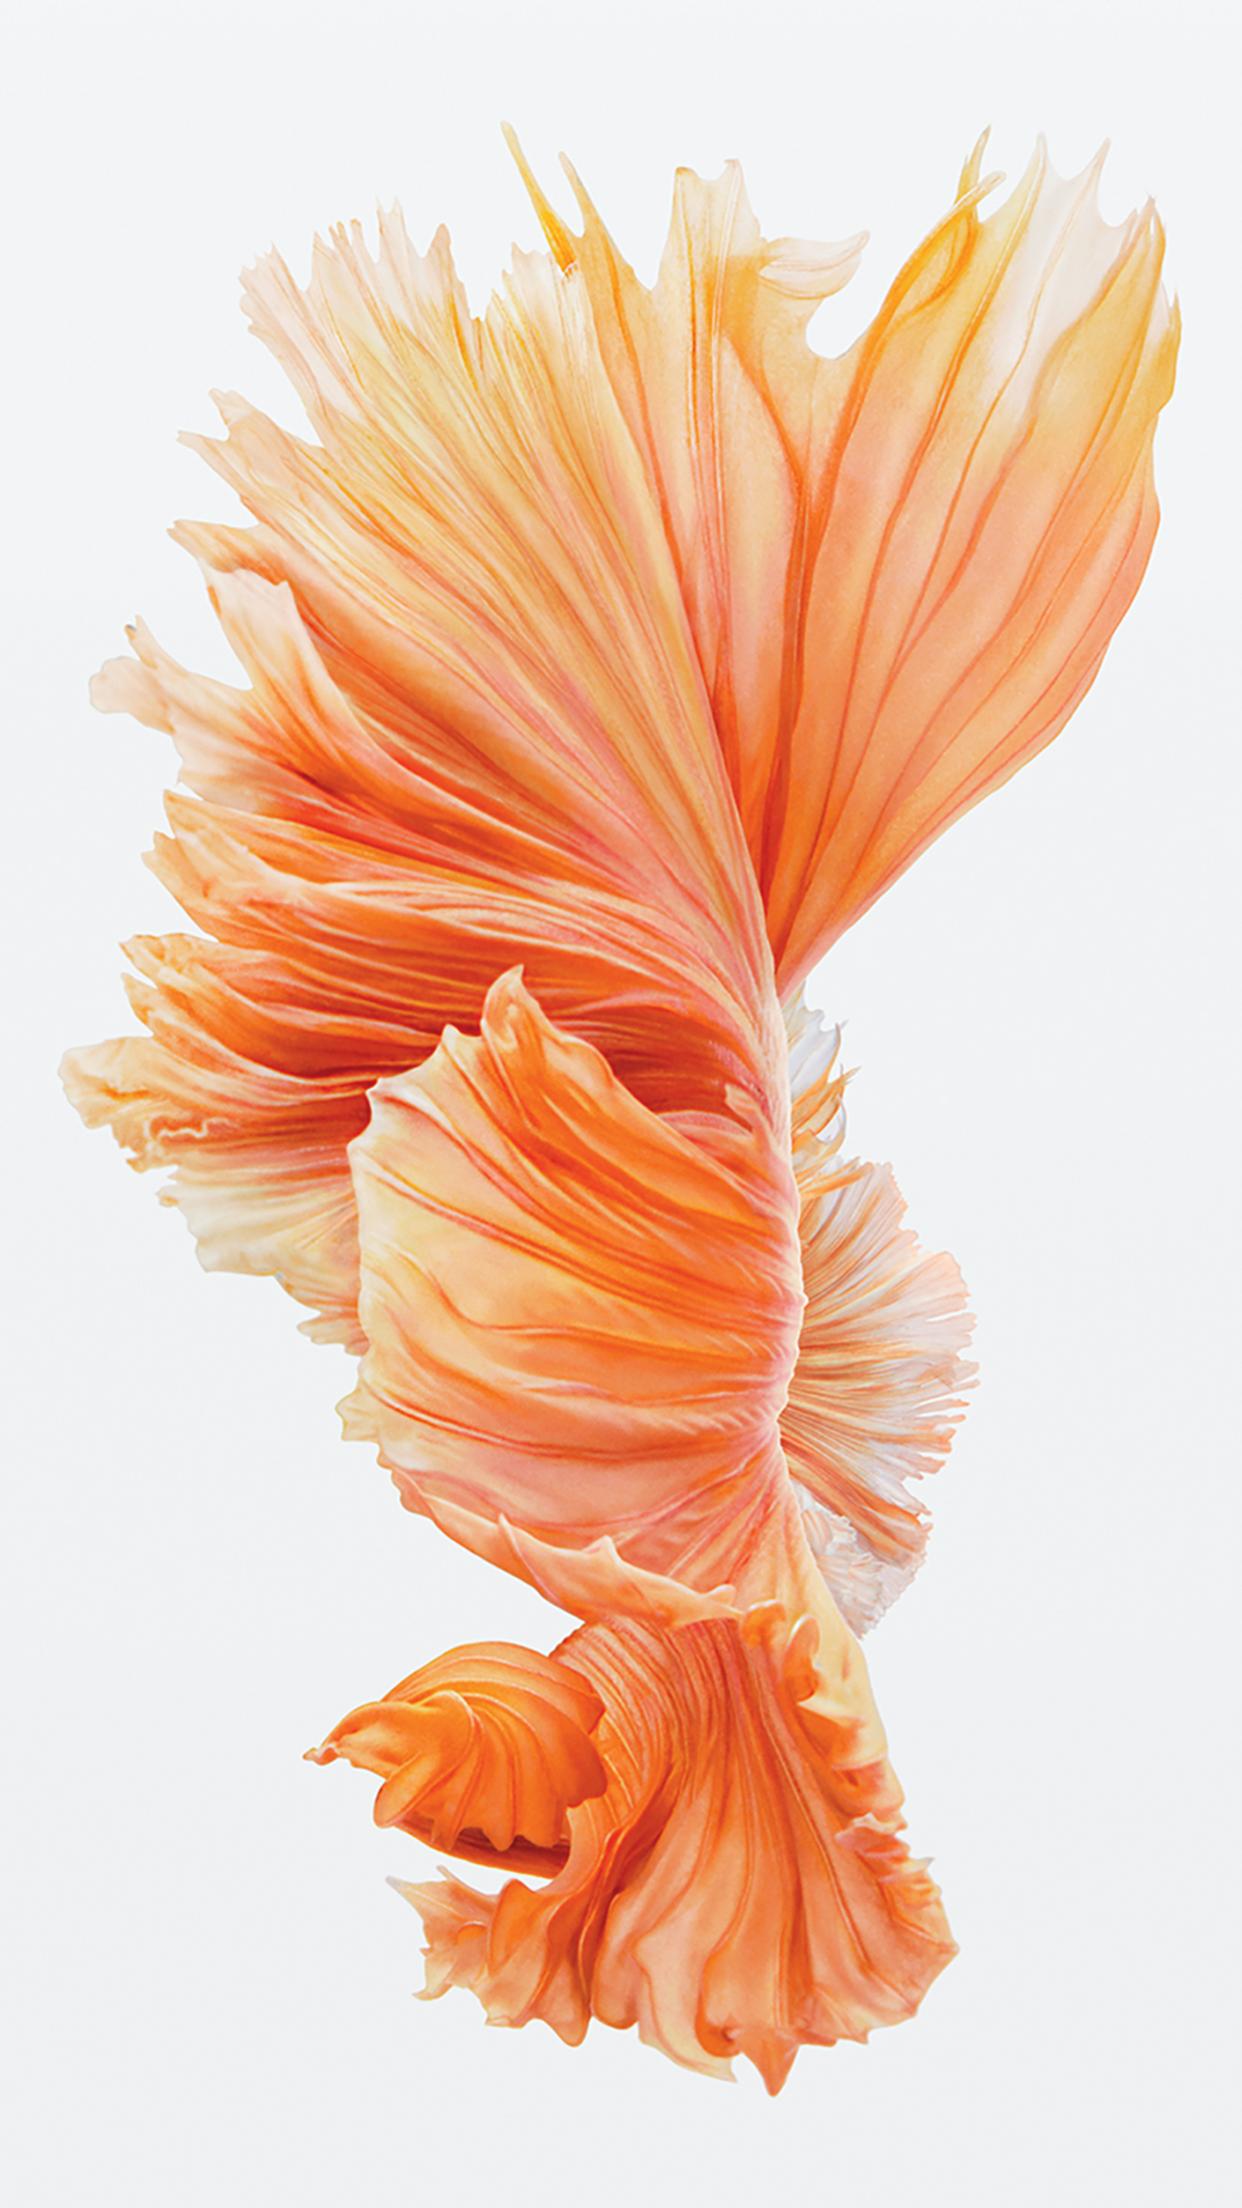 http://media.idownloadblog.com/wp-content/uploads/2015/09/iPhone-6s-Fish-Pink-Wallpaper.png